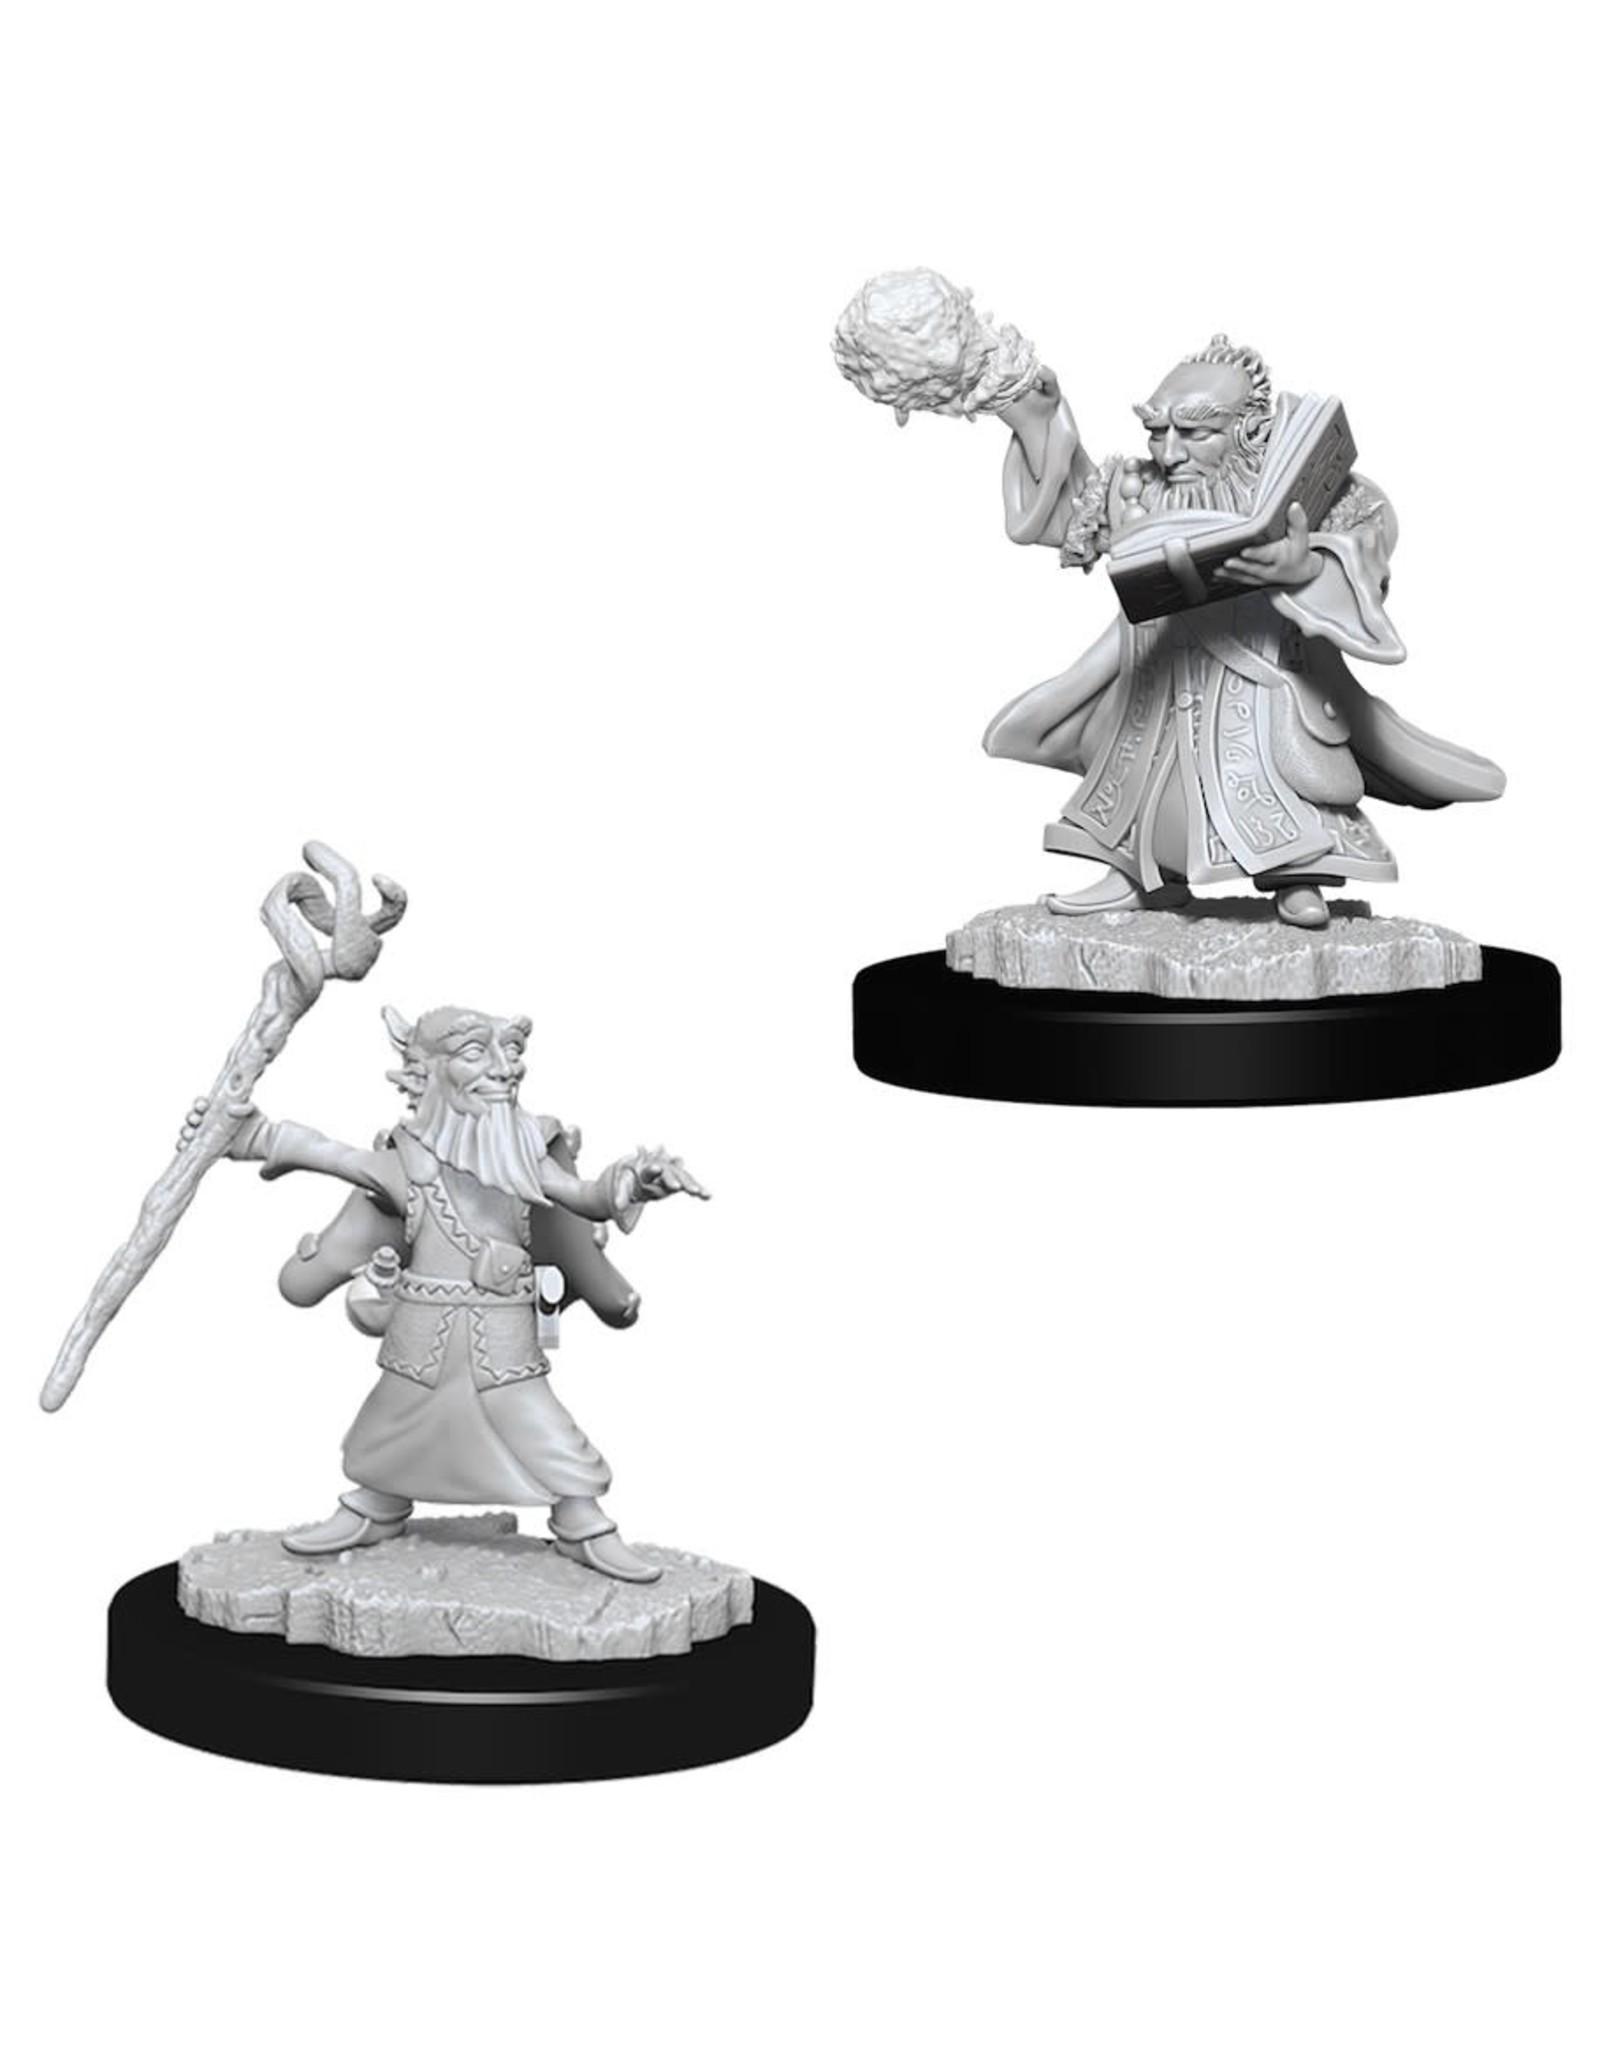 WizKids Dungeons & Dragons Minis Nolzur's Marvelous Miniatures Gnome Male Wizard Wave 6 (Unpainted)